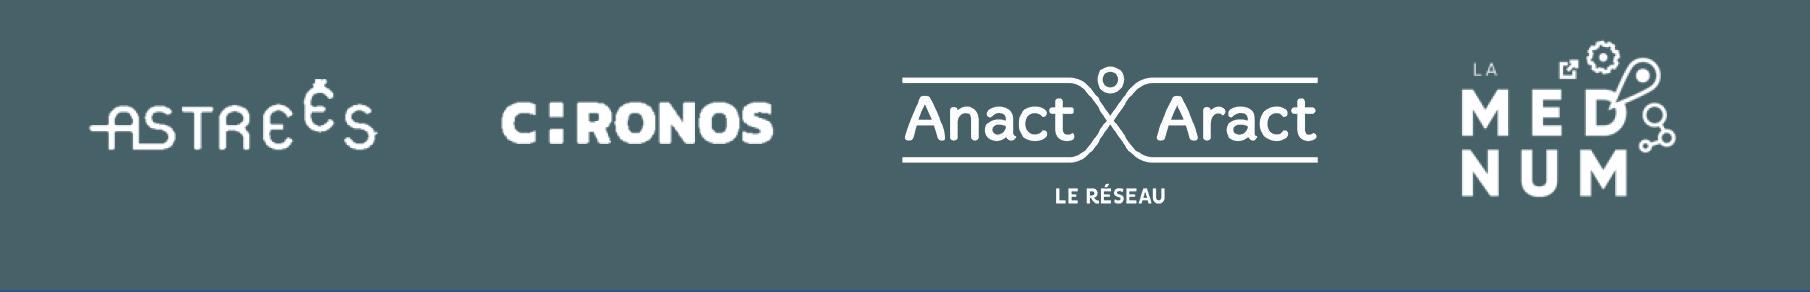 logos-article-appel_a_projet-fabrique